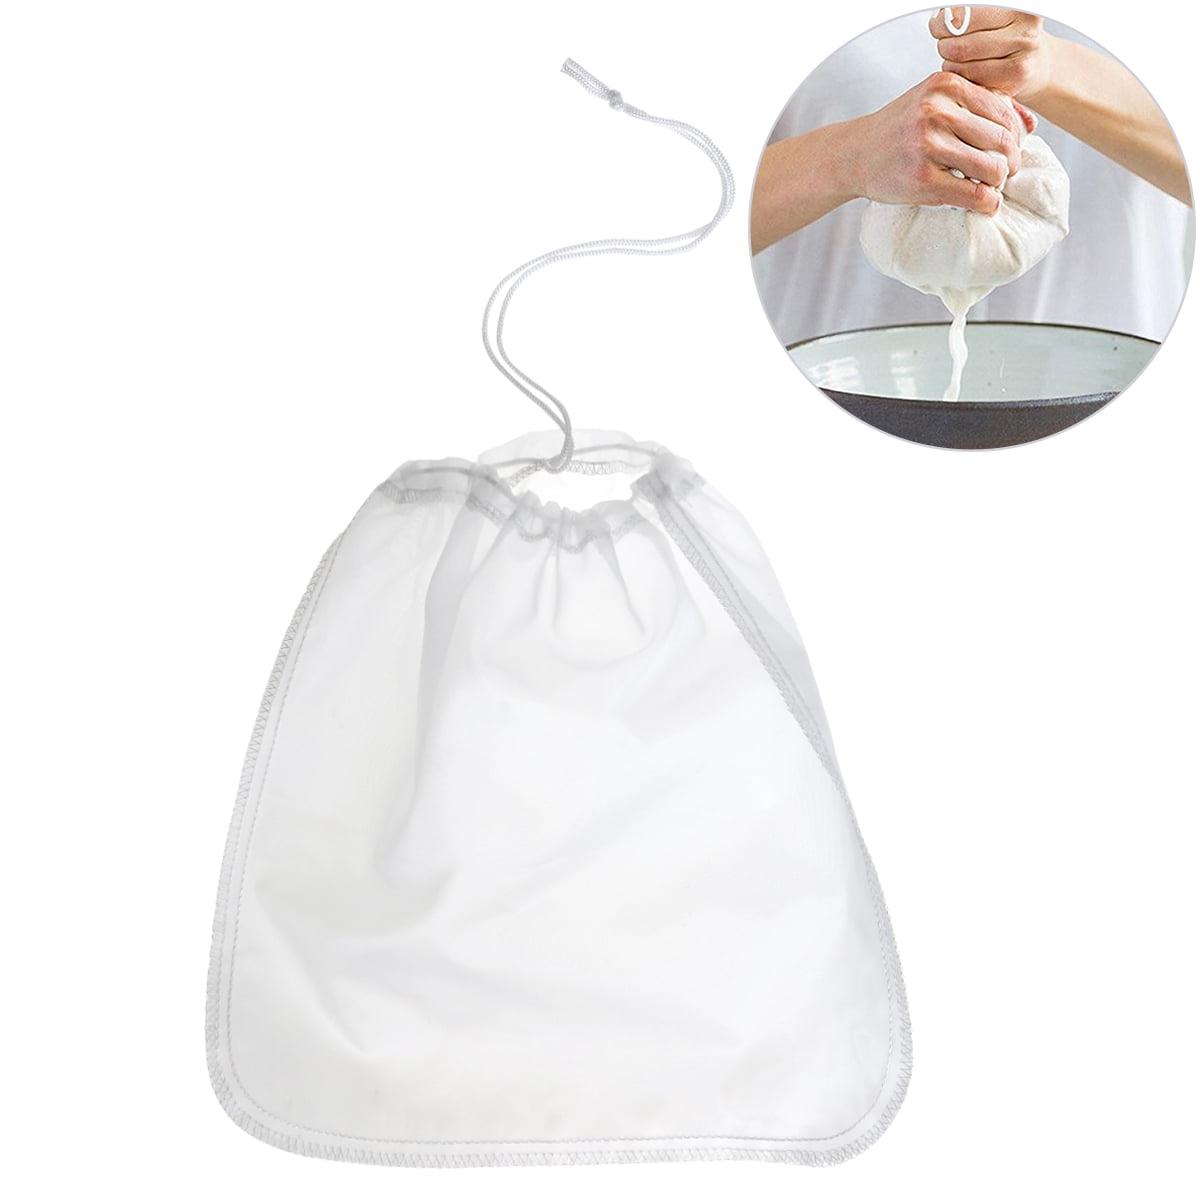 BESTOMZ 200μm Nut Milk Bag Reusable Almond Milk Bags Commercial Food Grade Fine Nylon Mesh Food Strainer &... by